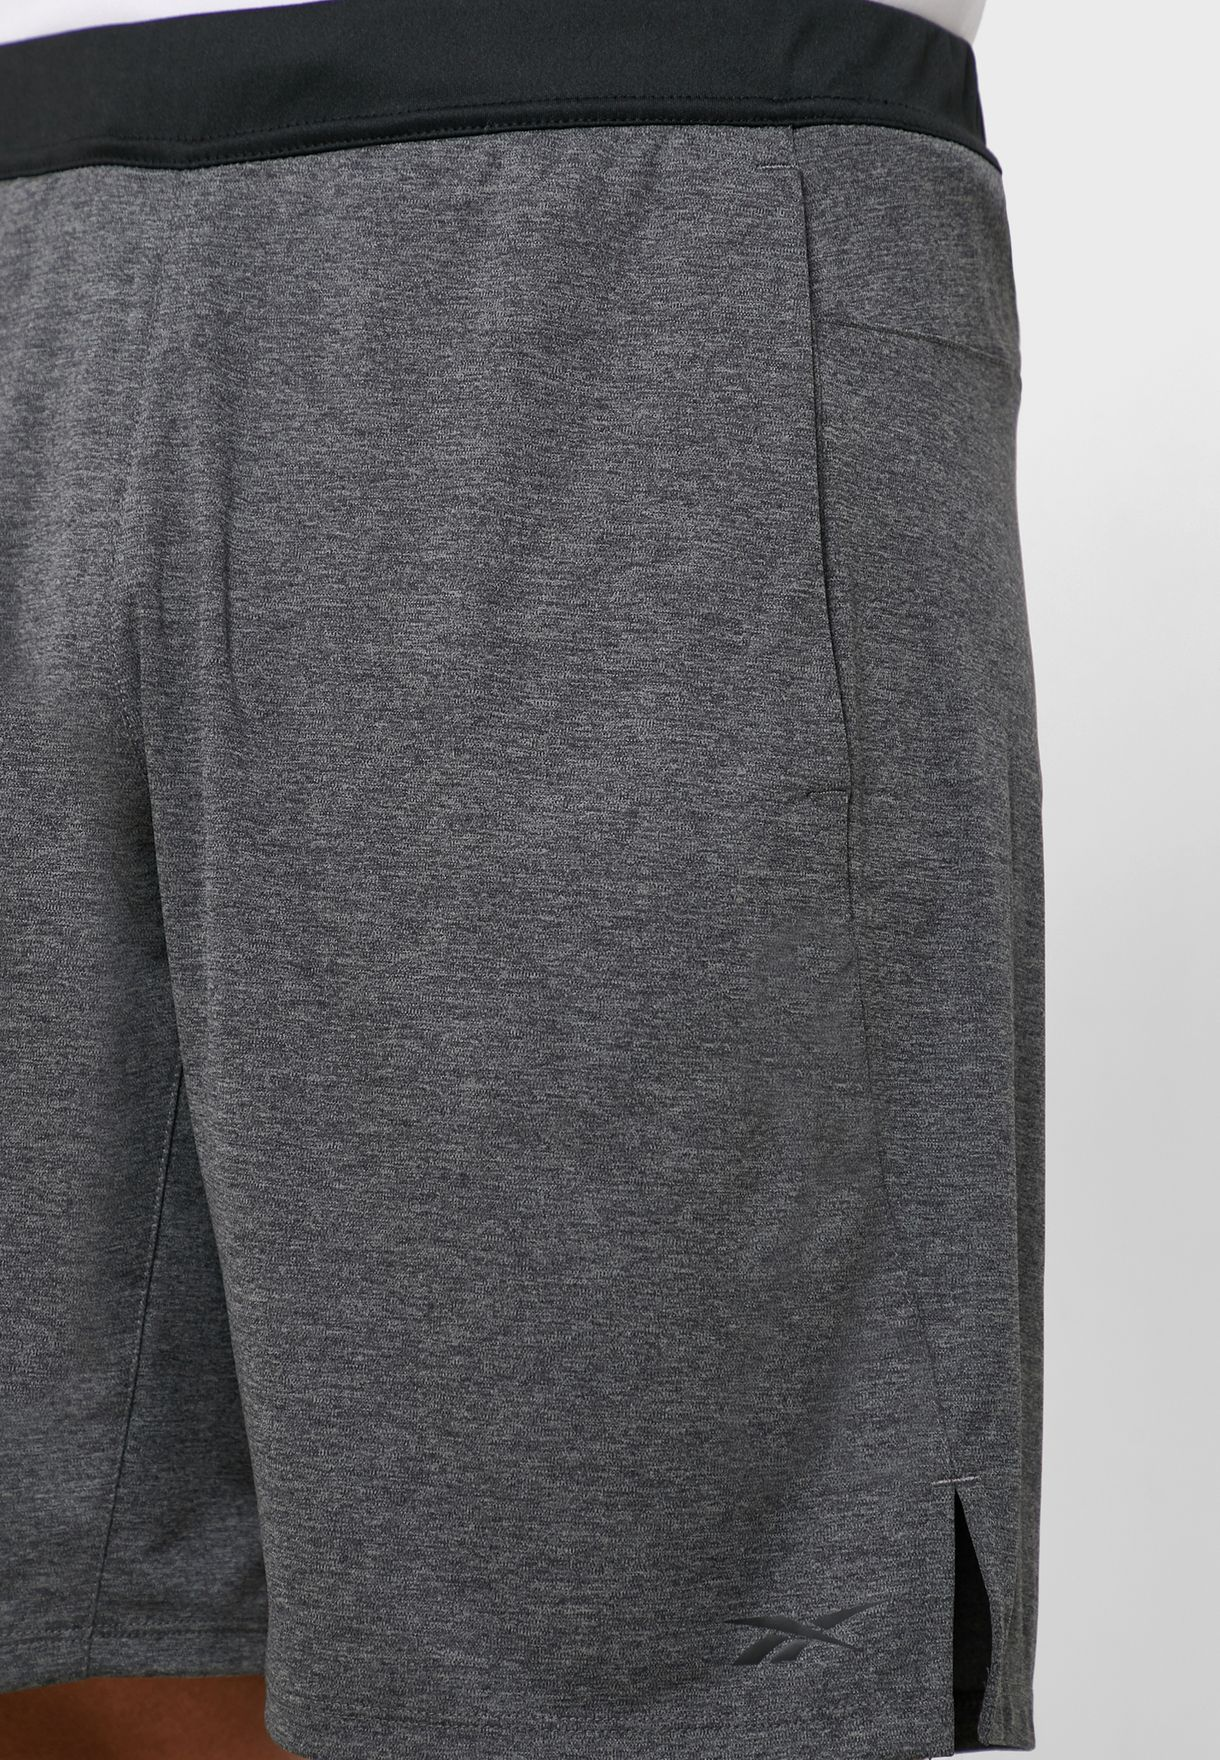 Training Supply Knit Shorts